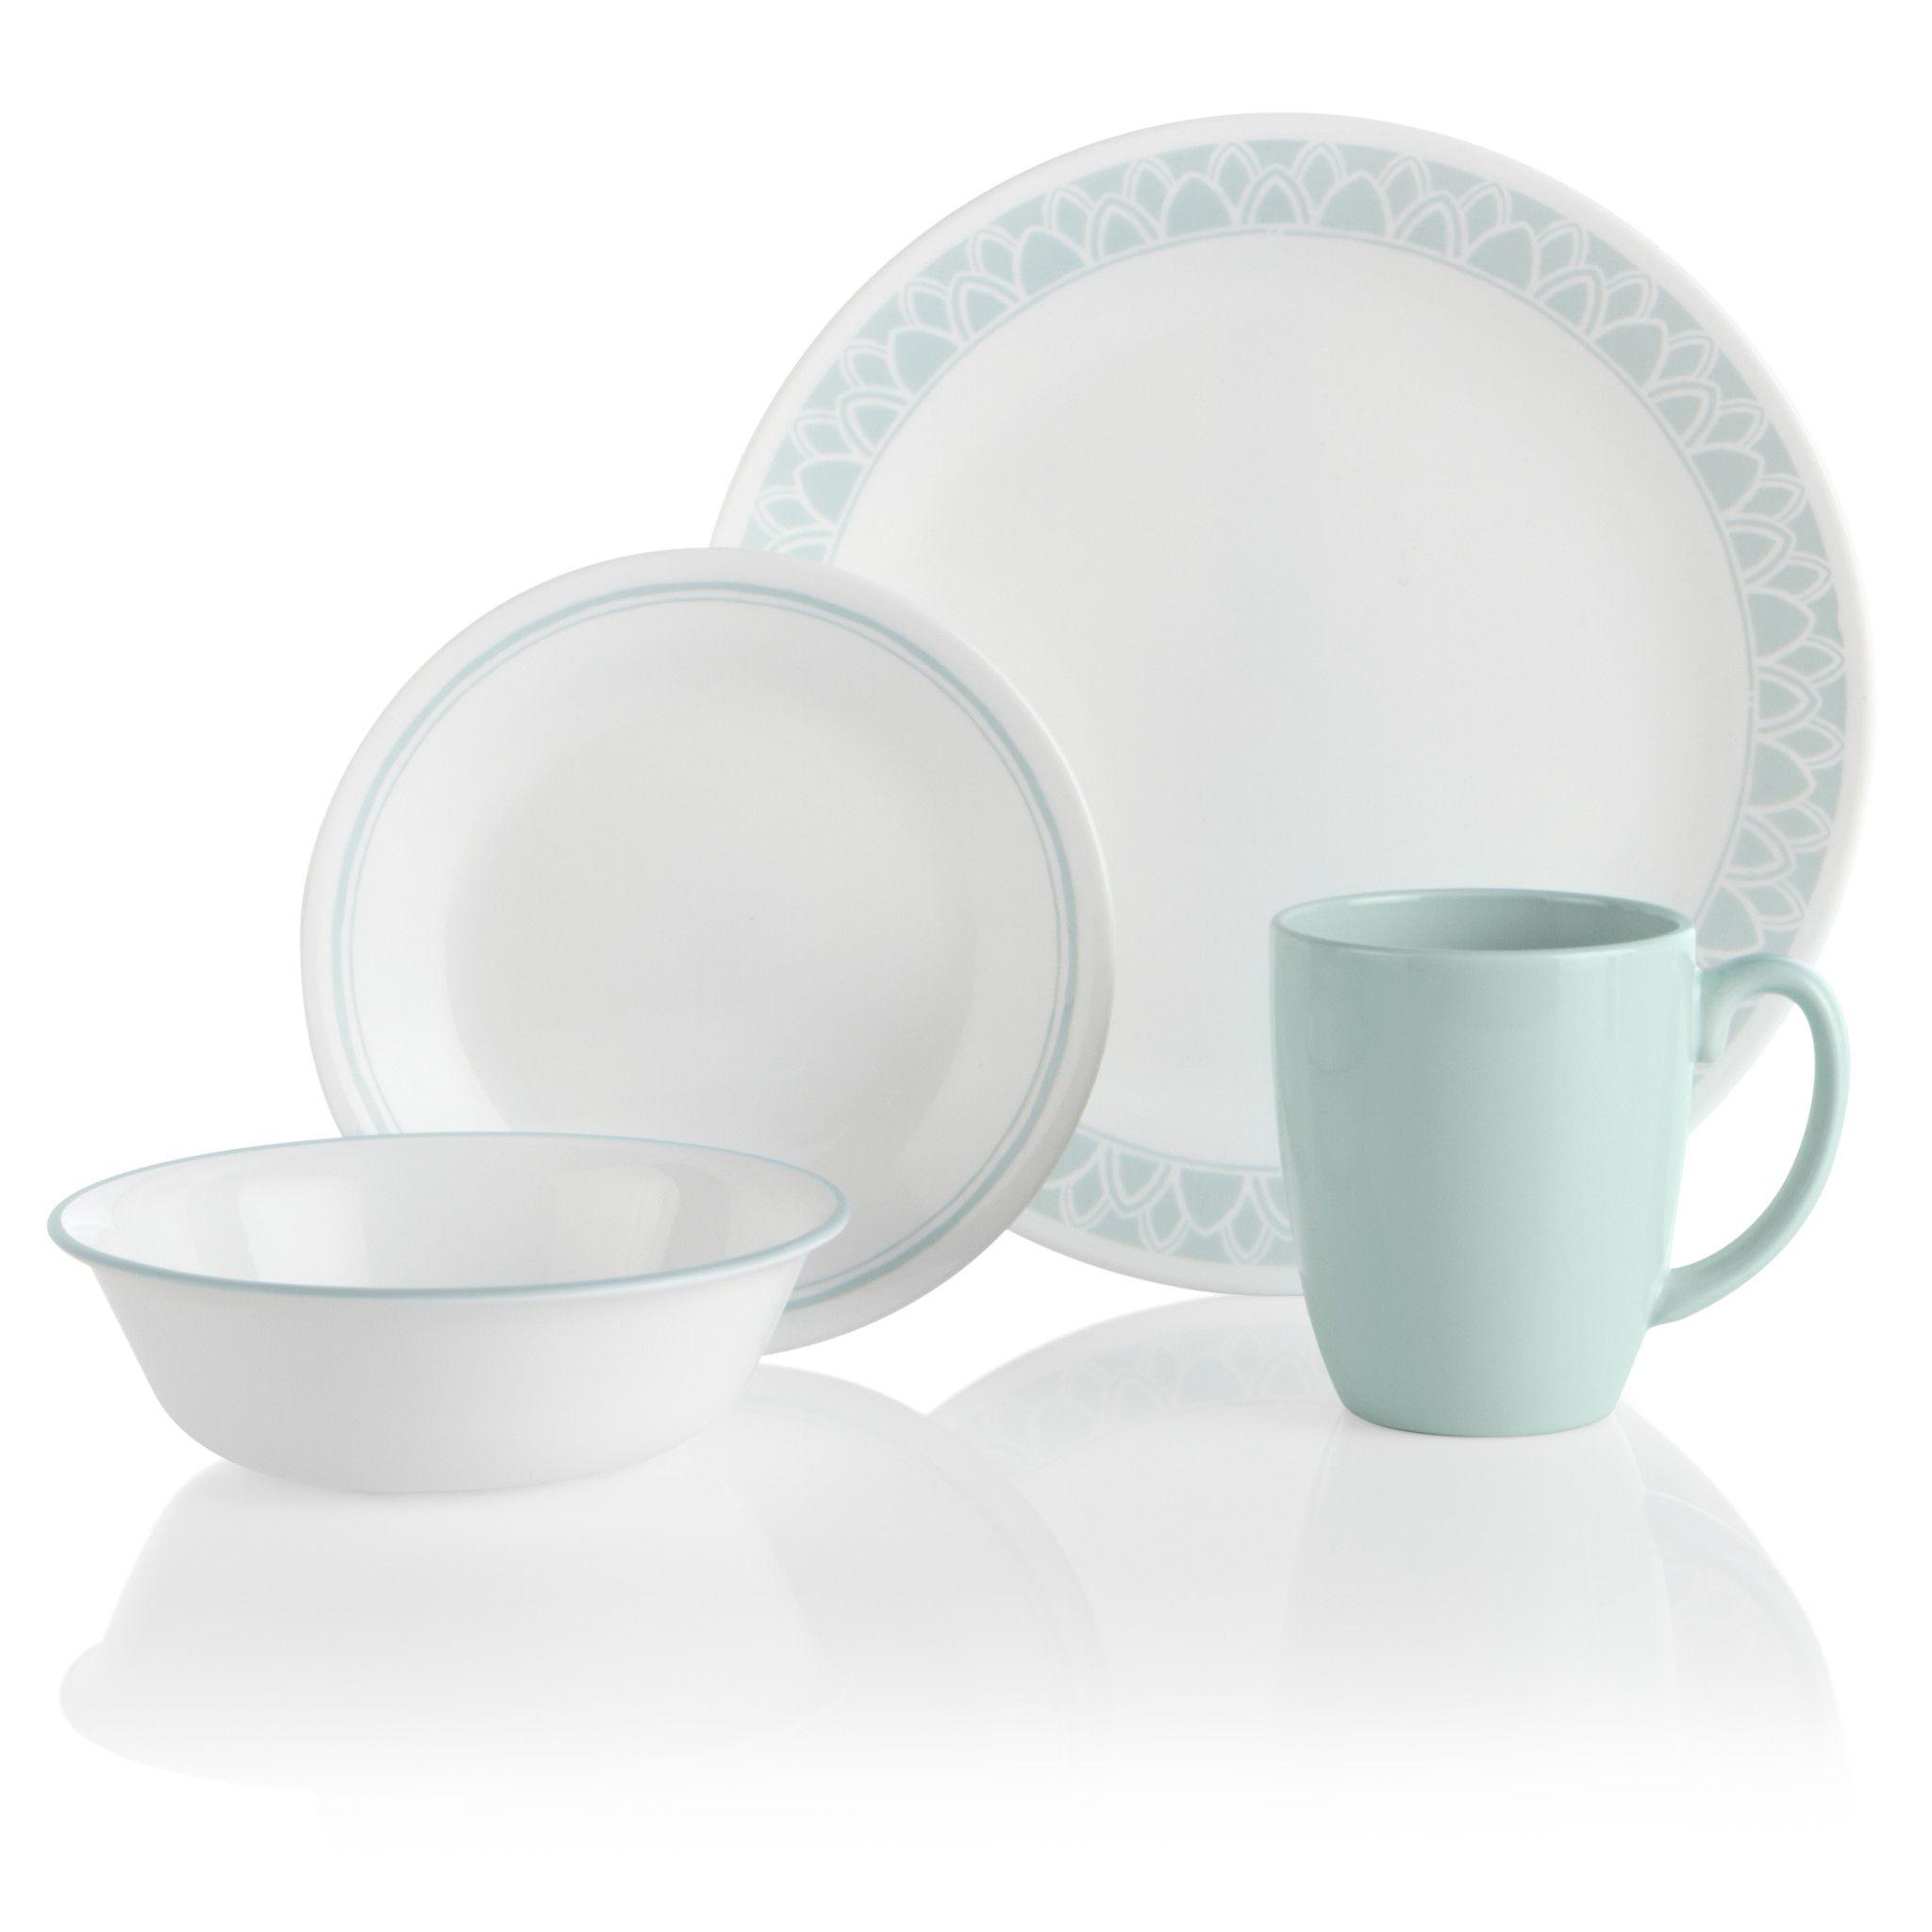 Delano 16 Pc Dinnerware Set Corelle